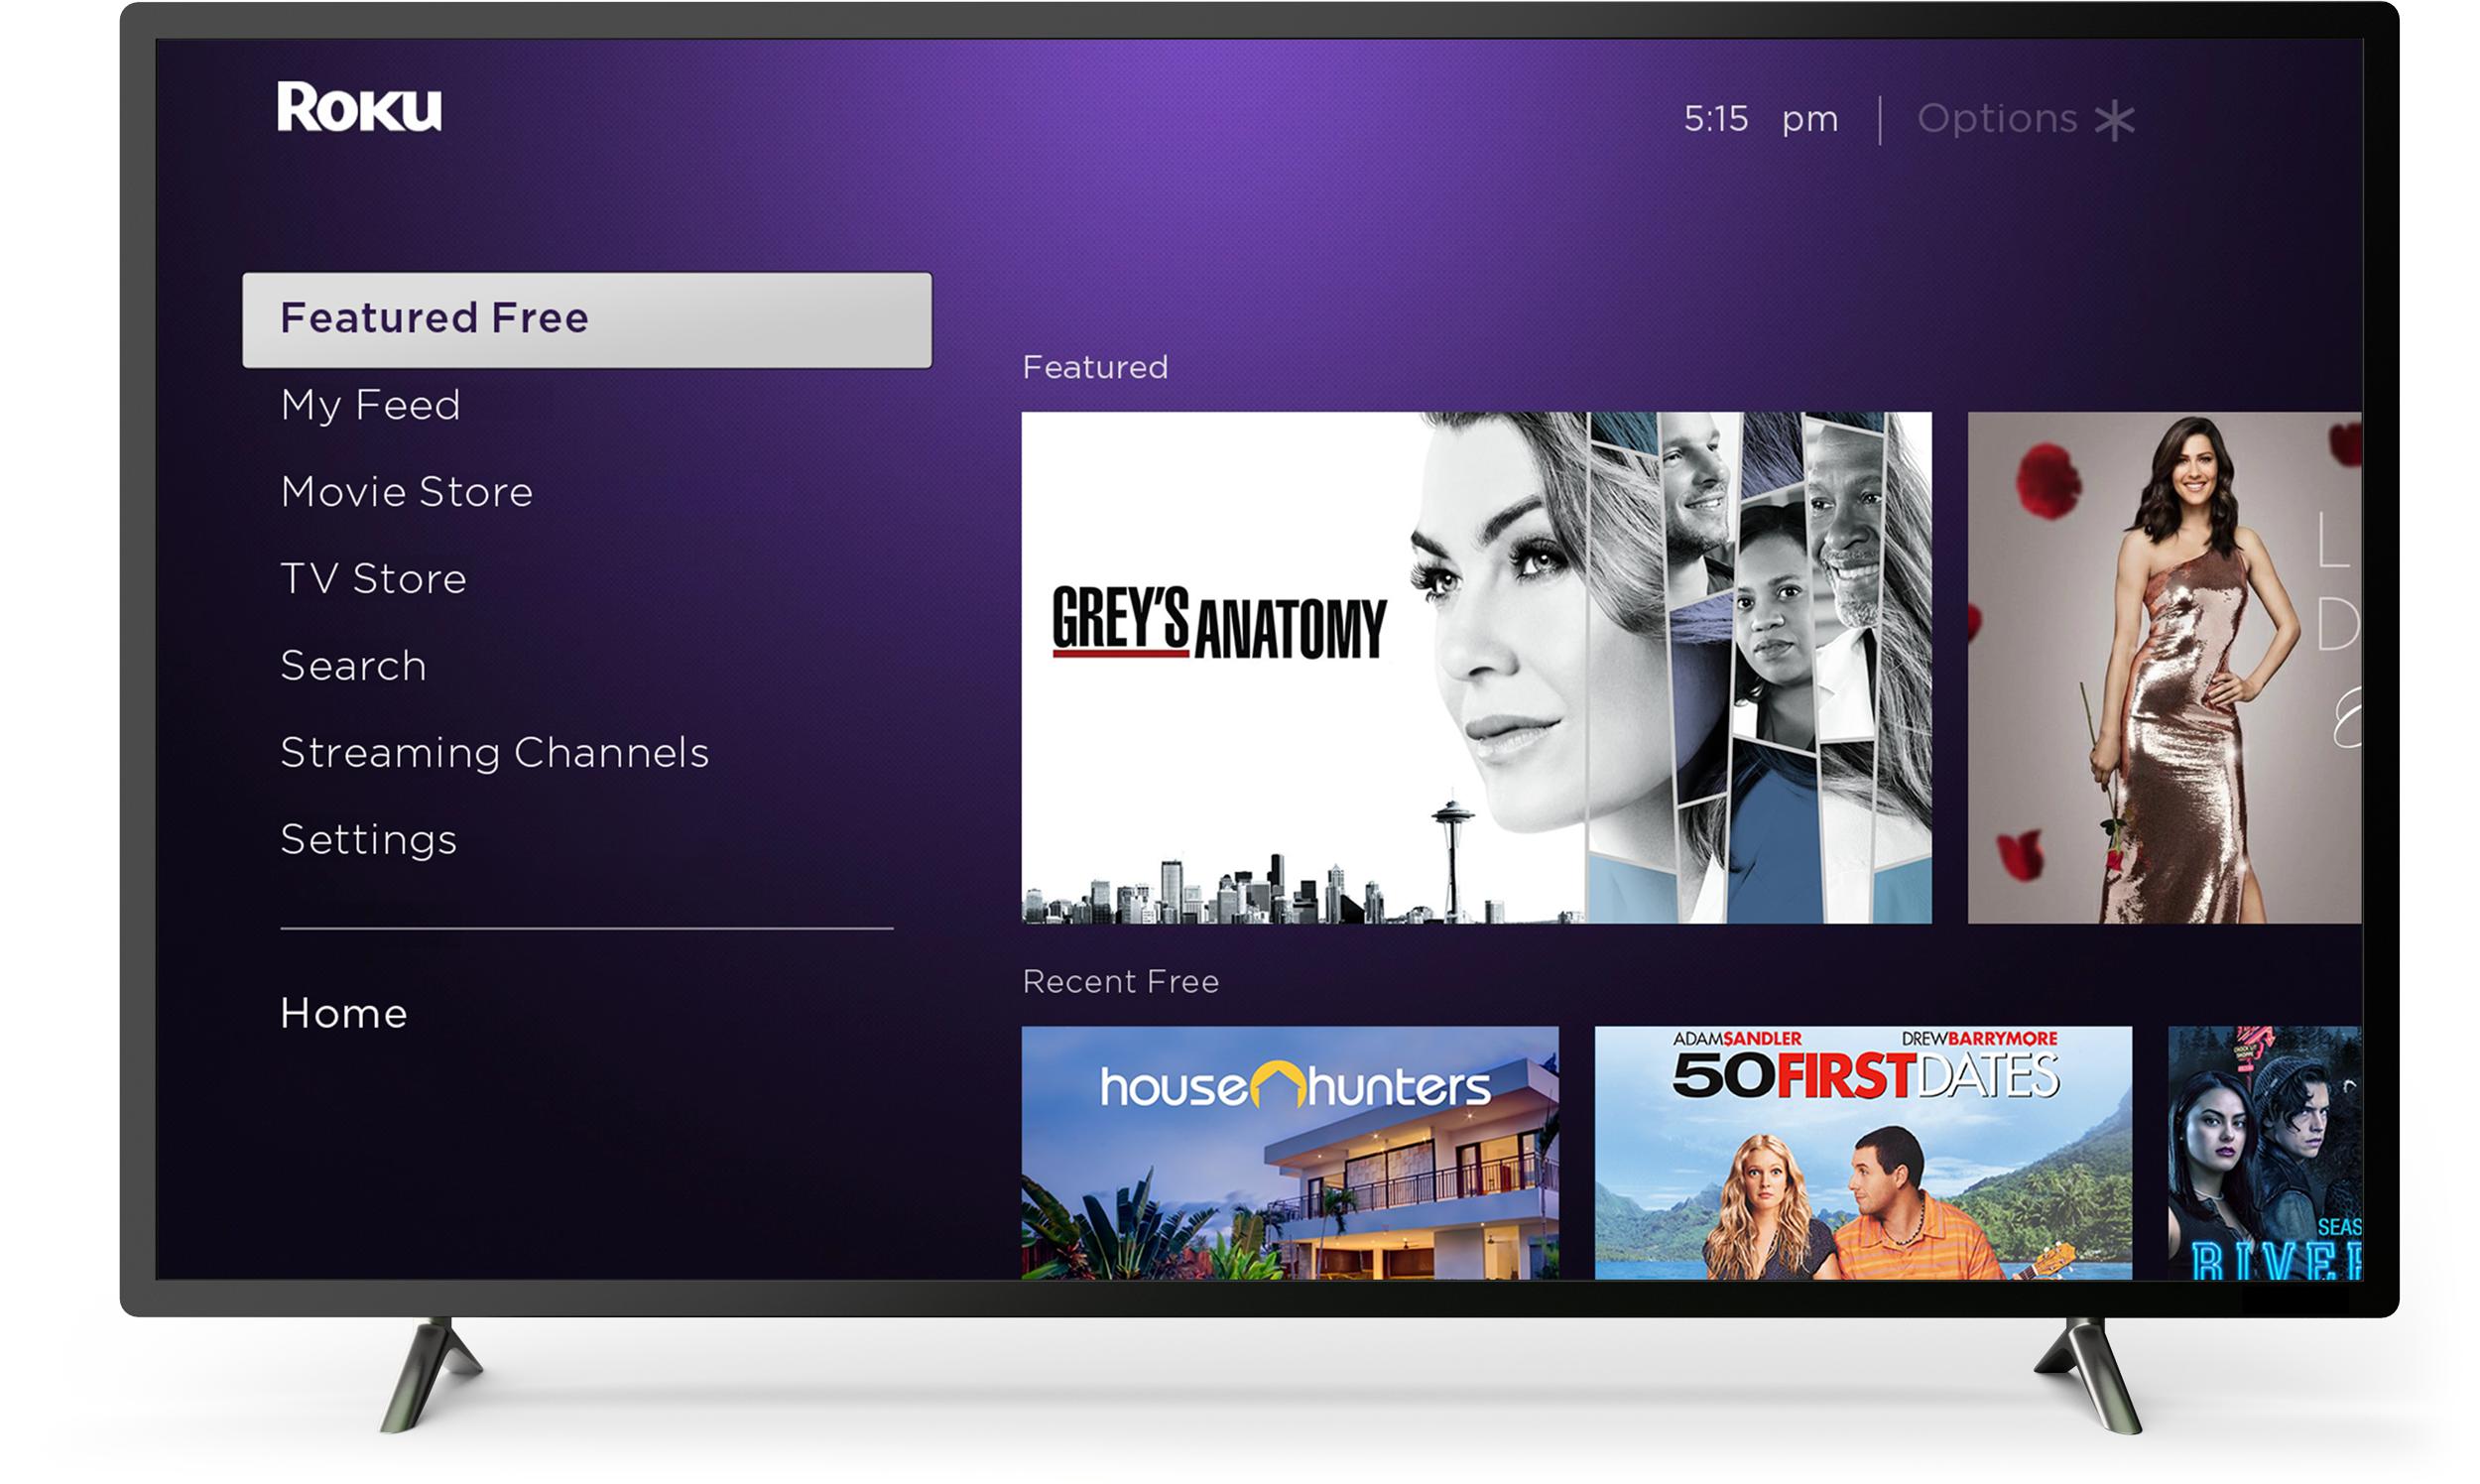 Roku interface displayed on a TV